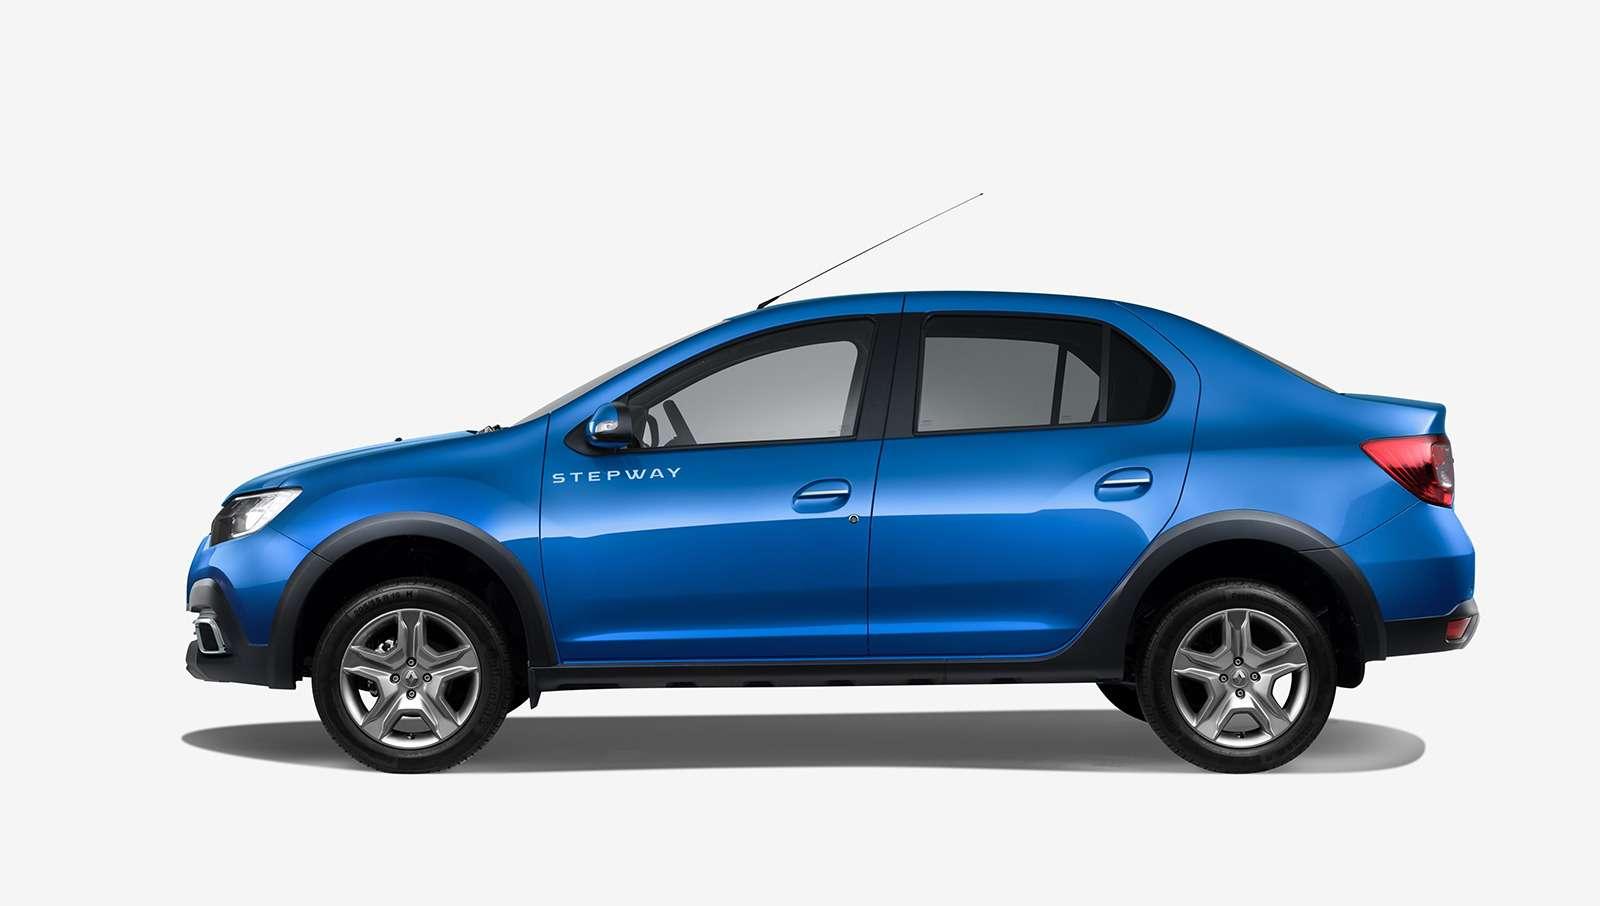 Renault объявила цены наLogan Stepway иSandero Stepway— фото 913027